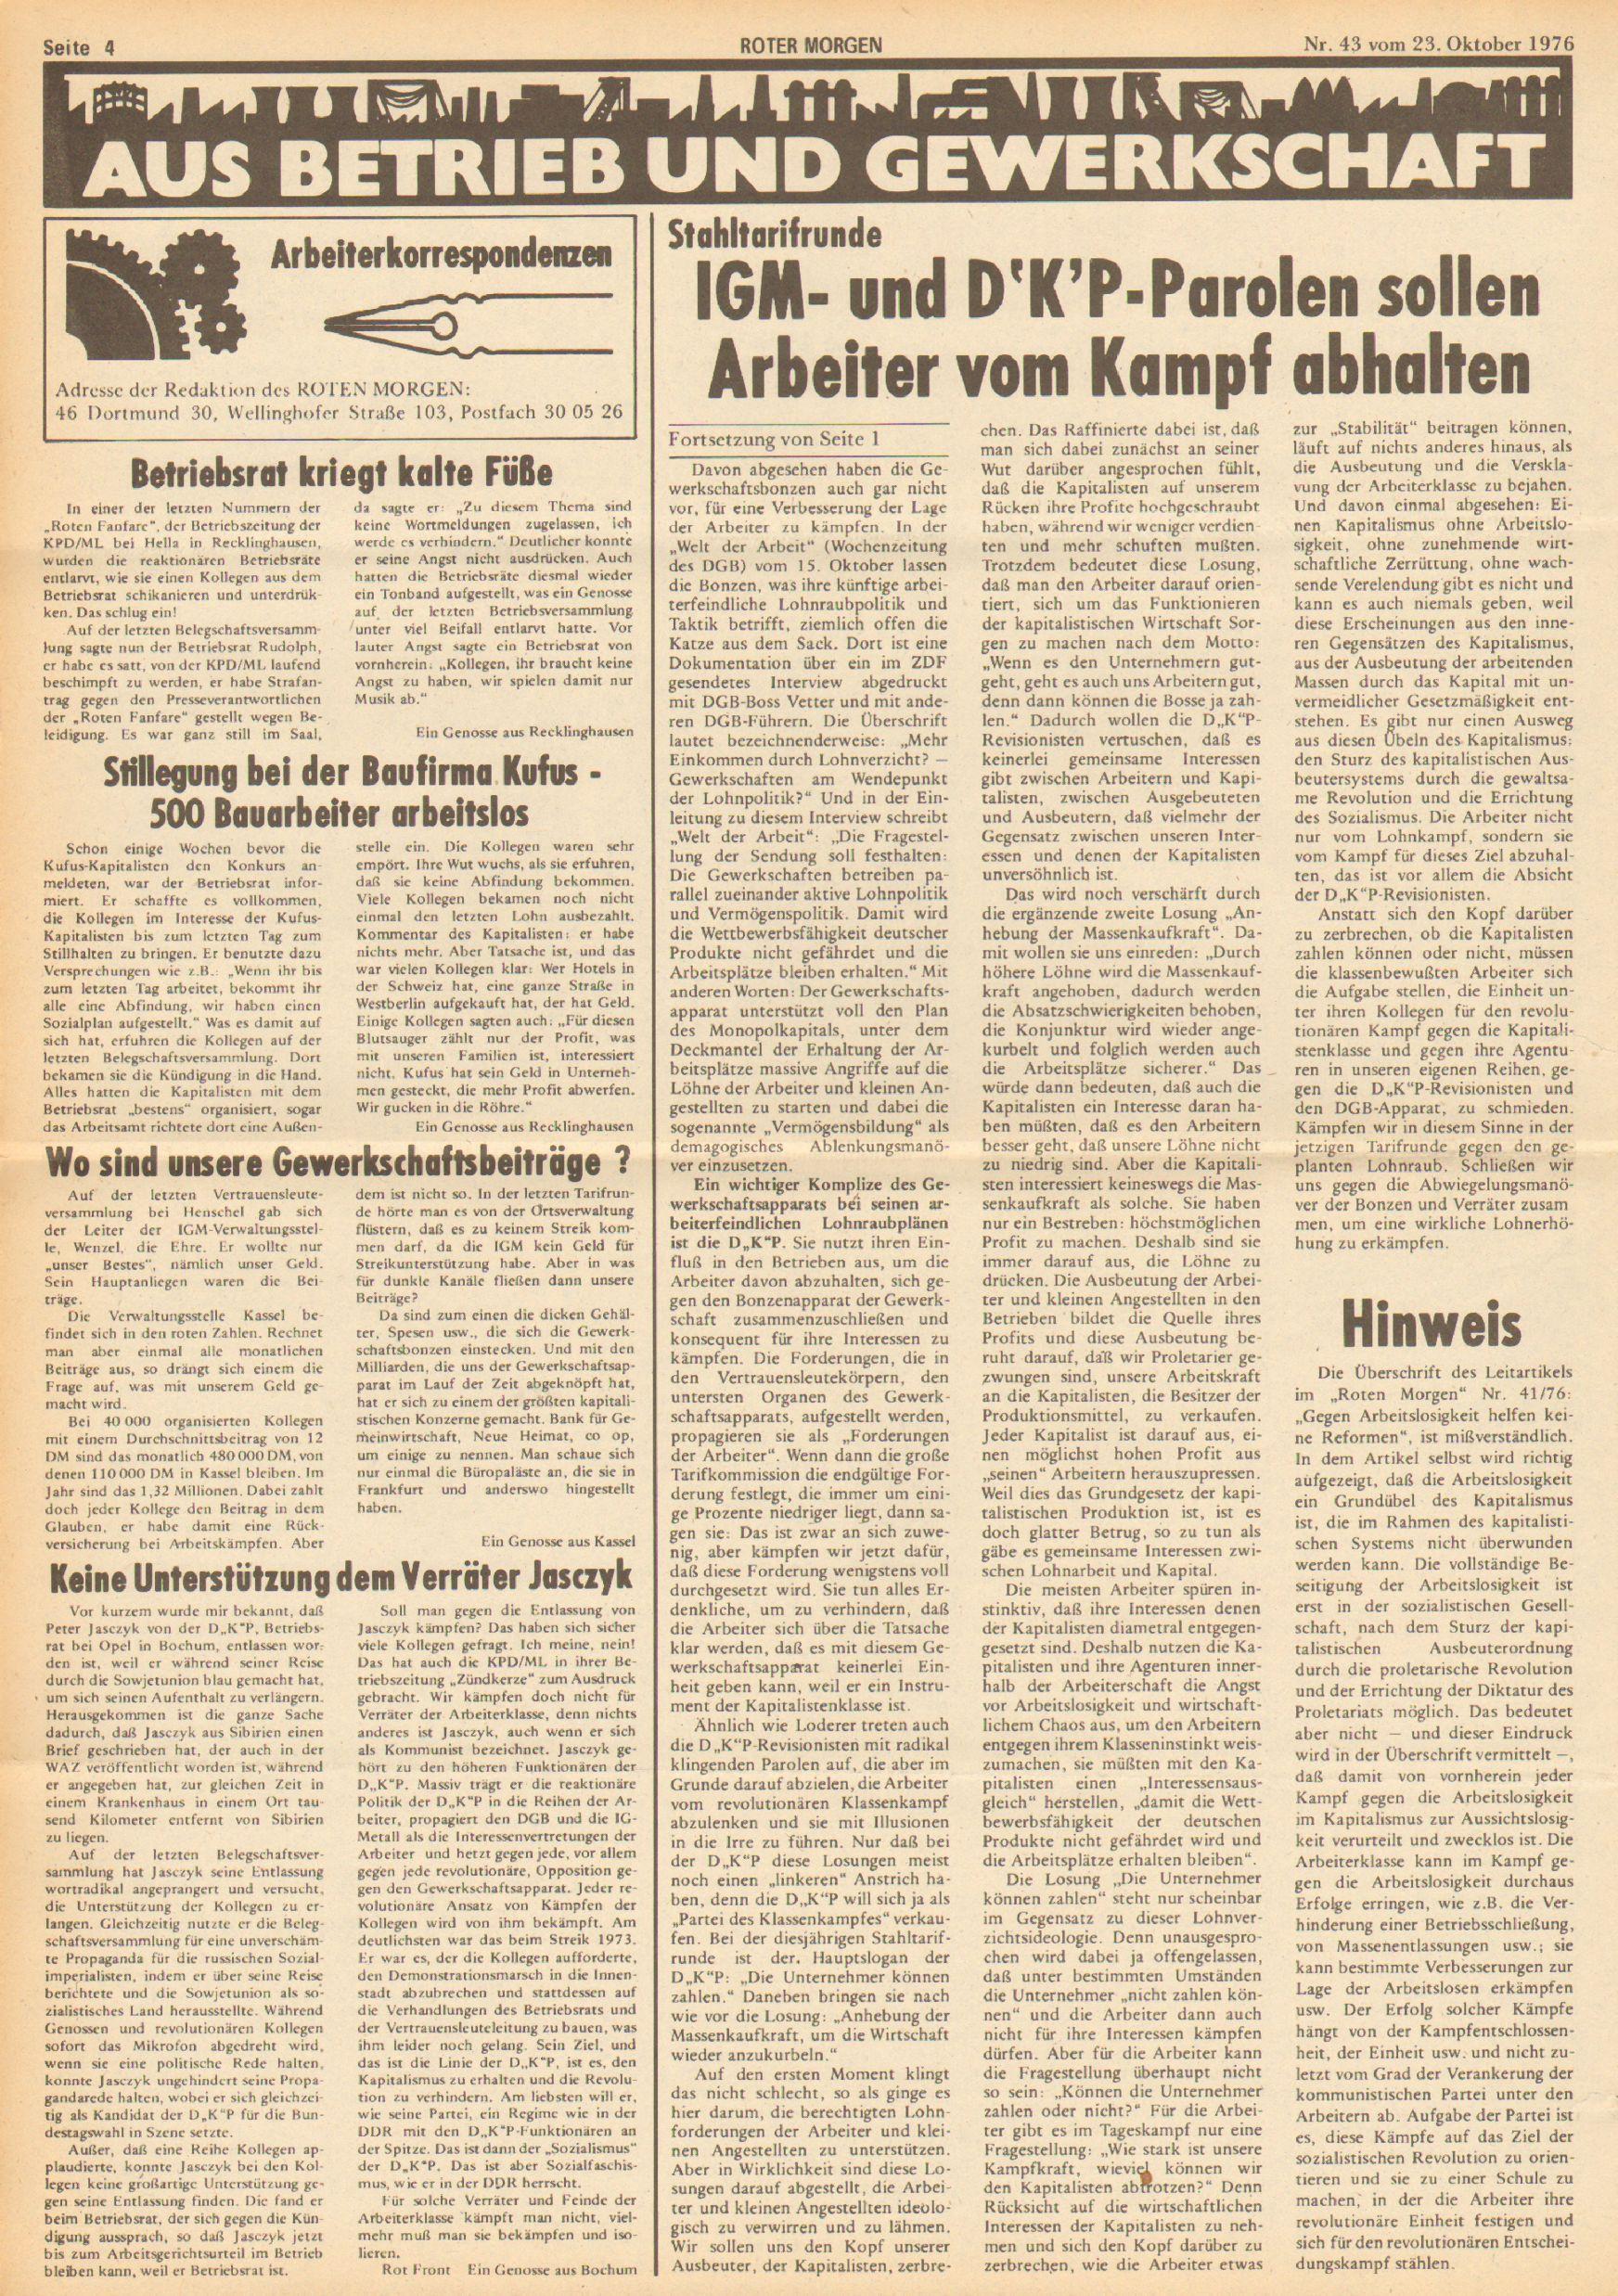 Roter Morgen, 10. Jg., 23. Oktober 1976, Nr. 43, Seite 4